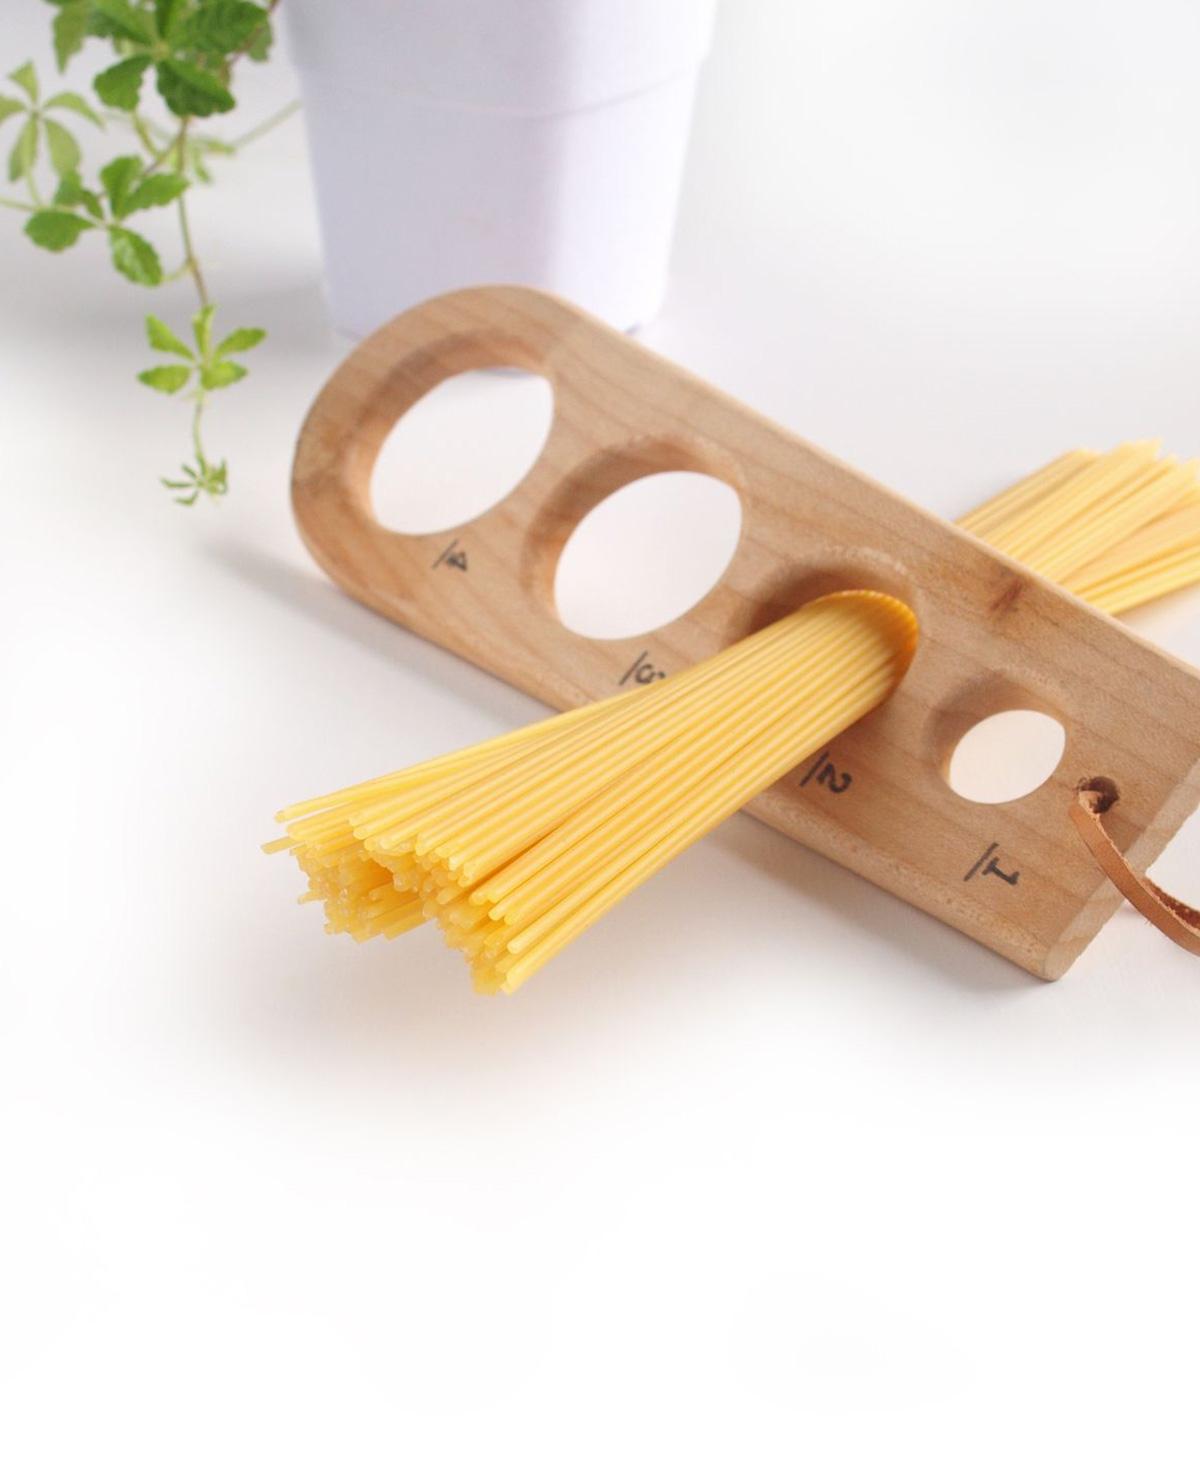 Zo meet je de perfecte hoeveelheid spaghetti